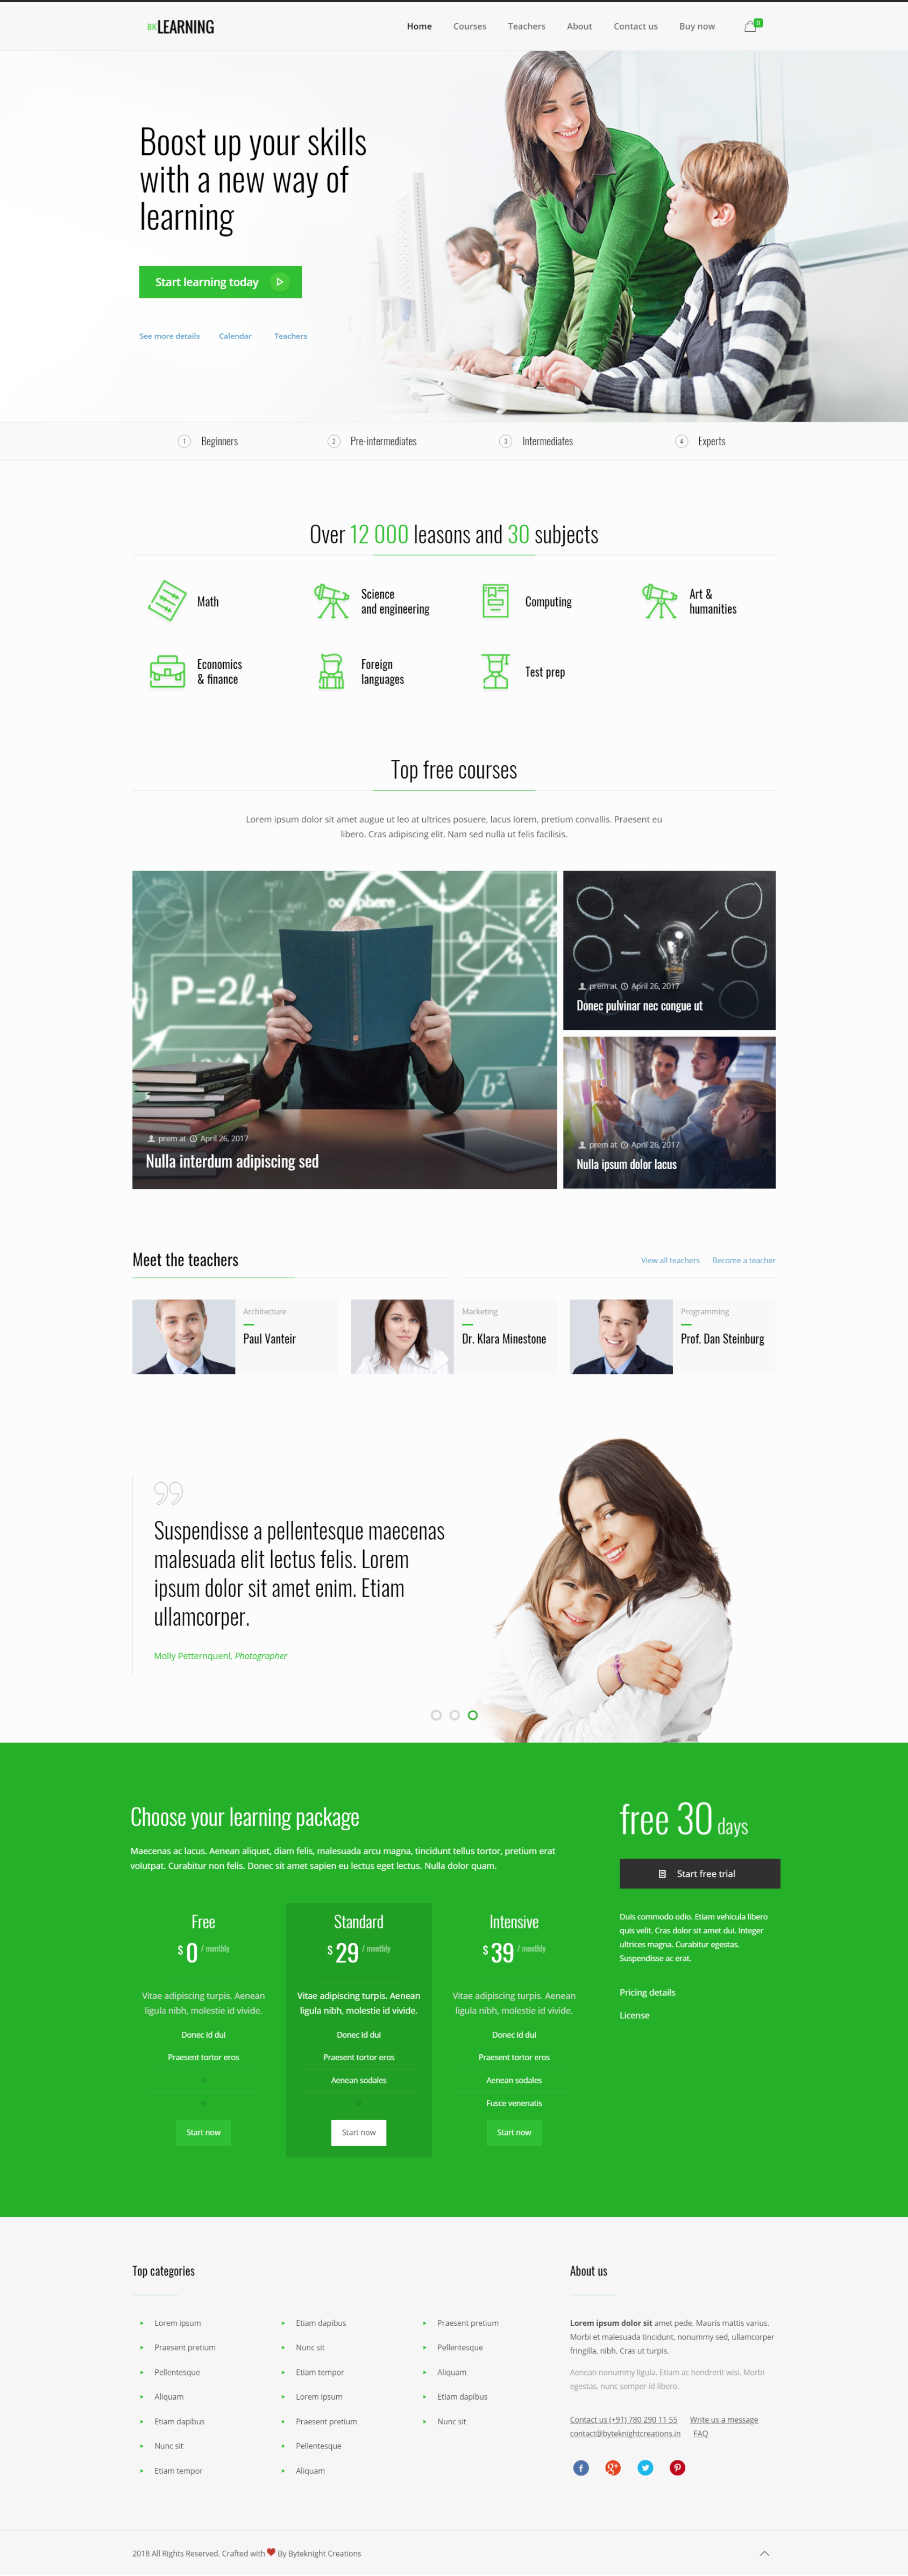 E Learning Website Design Demo Elearning Websitedesigns Education Study Online Bkwebdes Learning Website Design Elearning Design Website Template Design